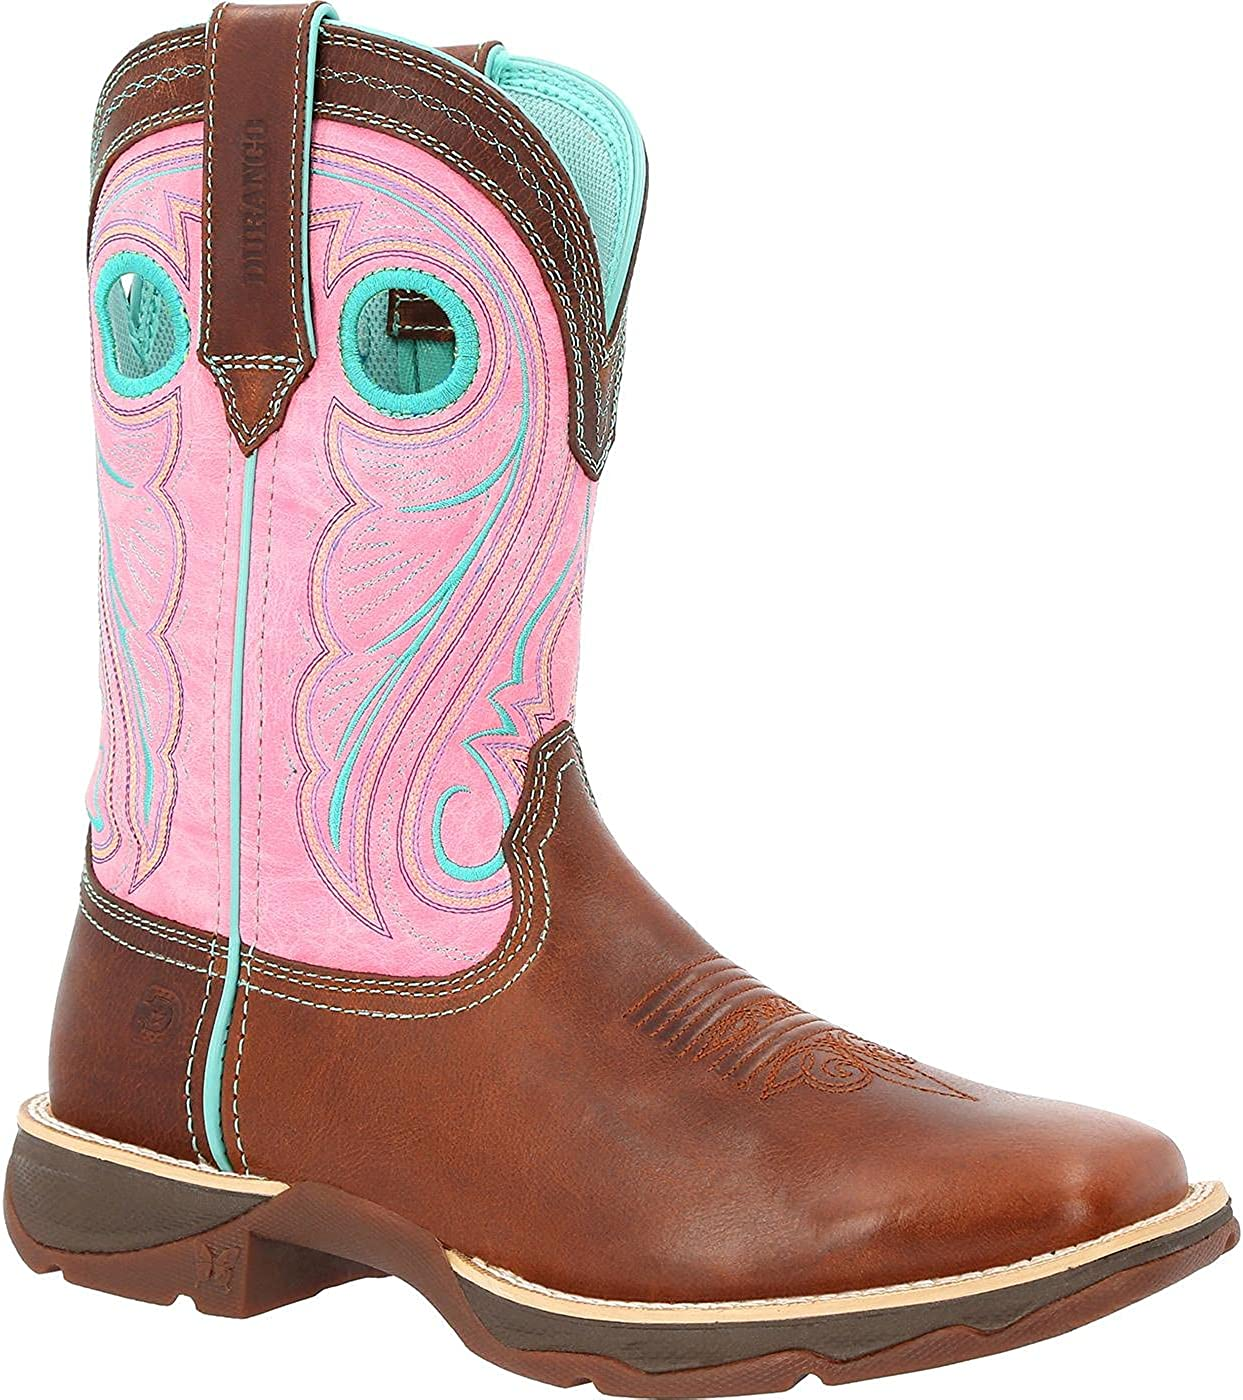 New mail order mart Durango Women's Rebel Boot 10